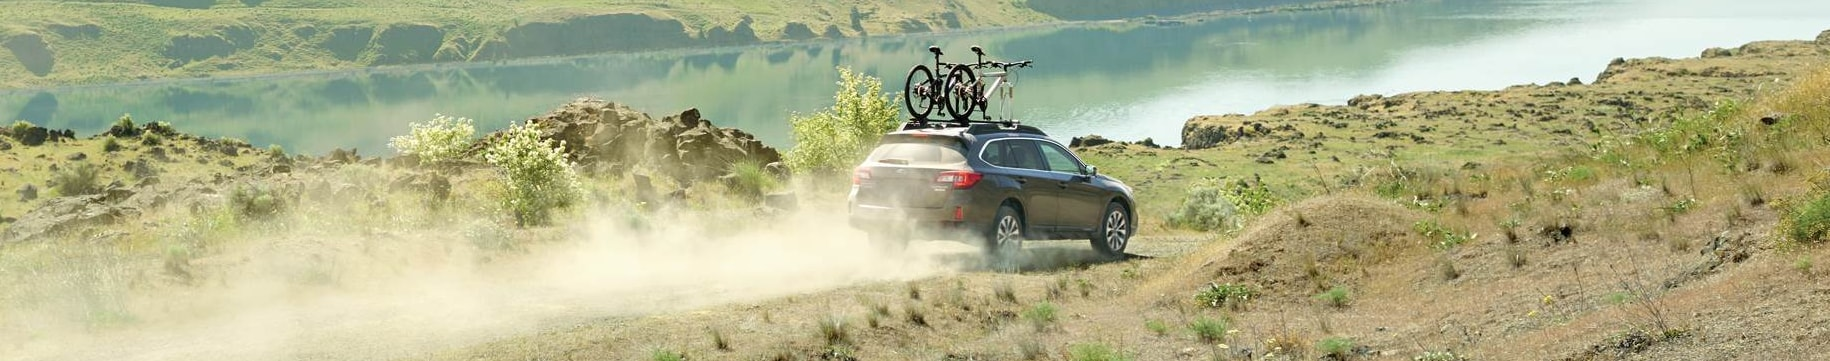 The New Subaru Outback